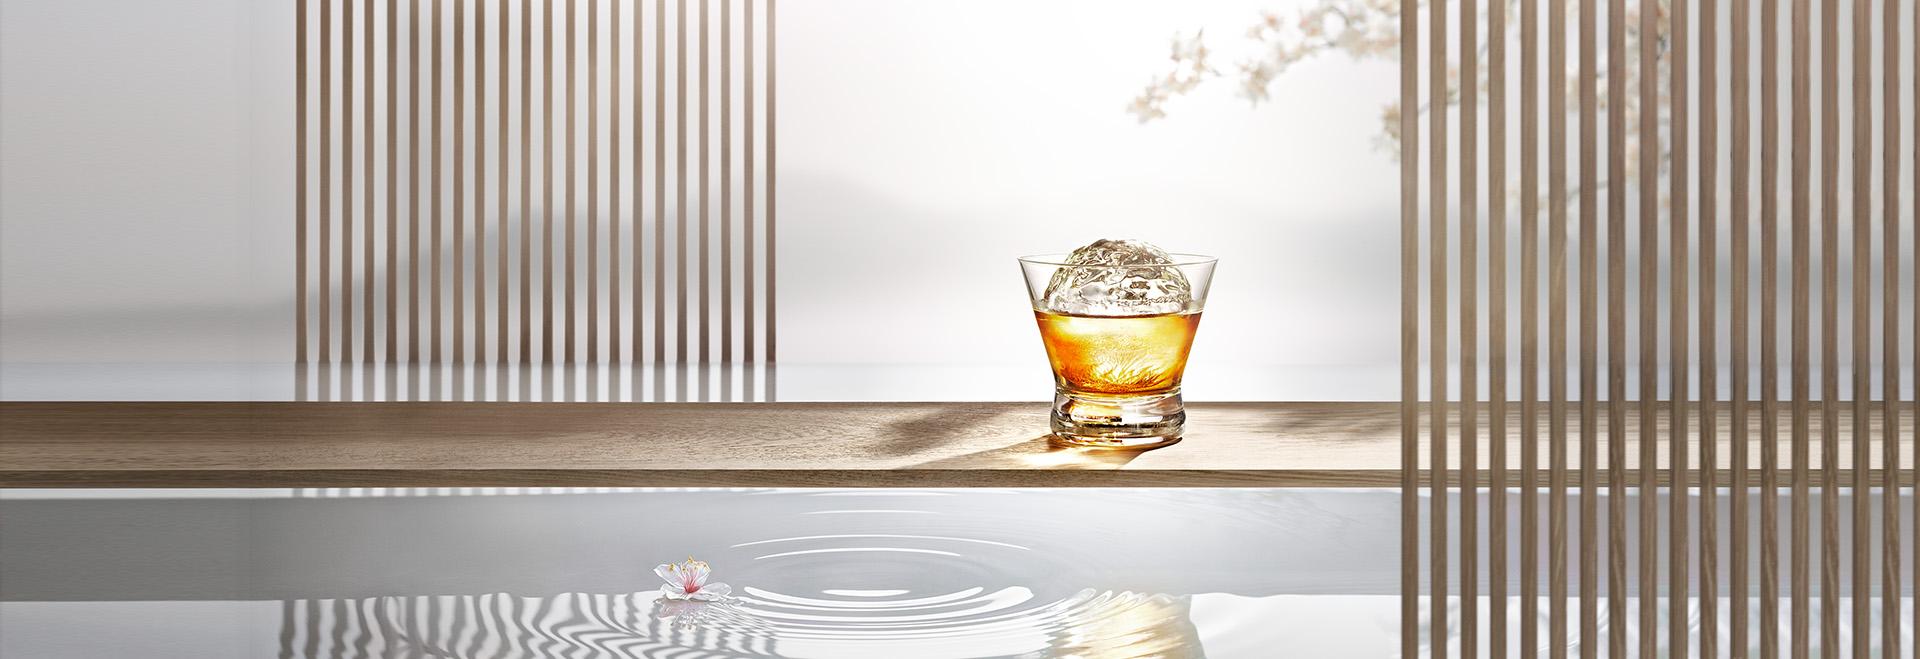 yamazaki-55-ans-vieux-whisky-japonais